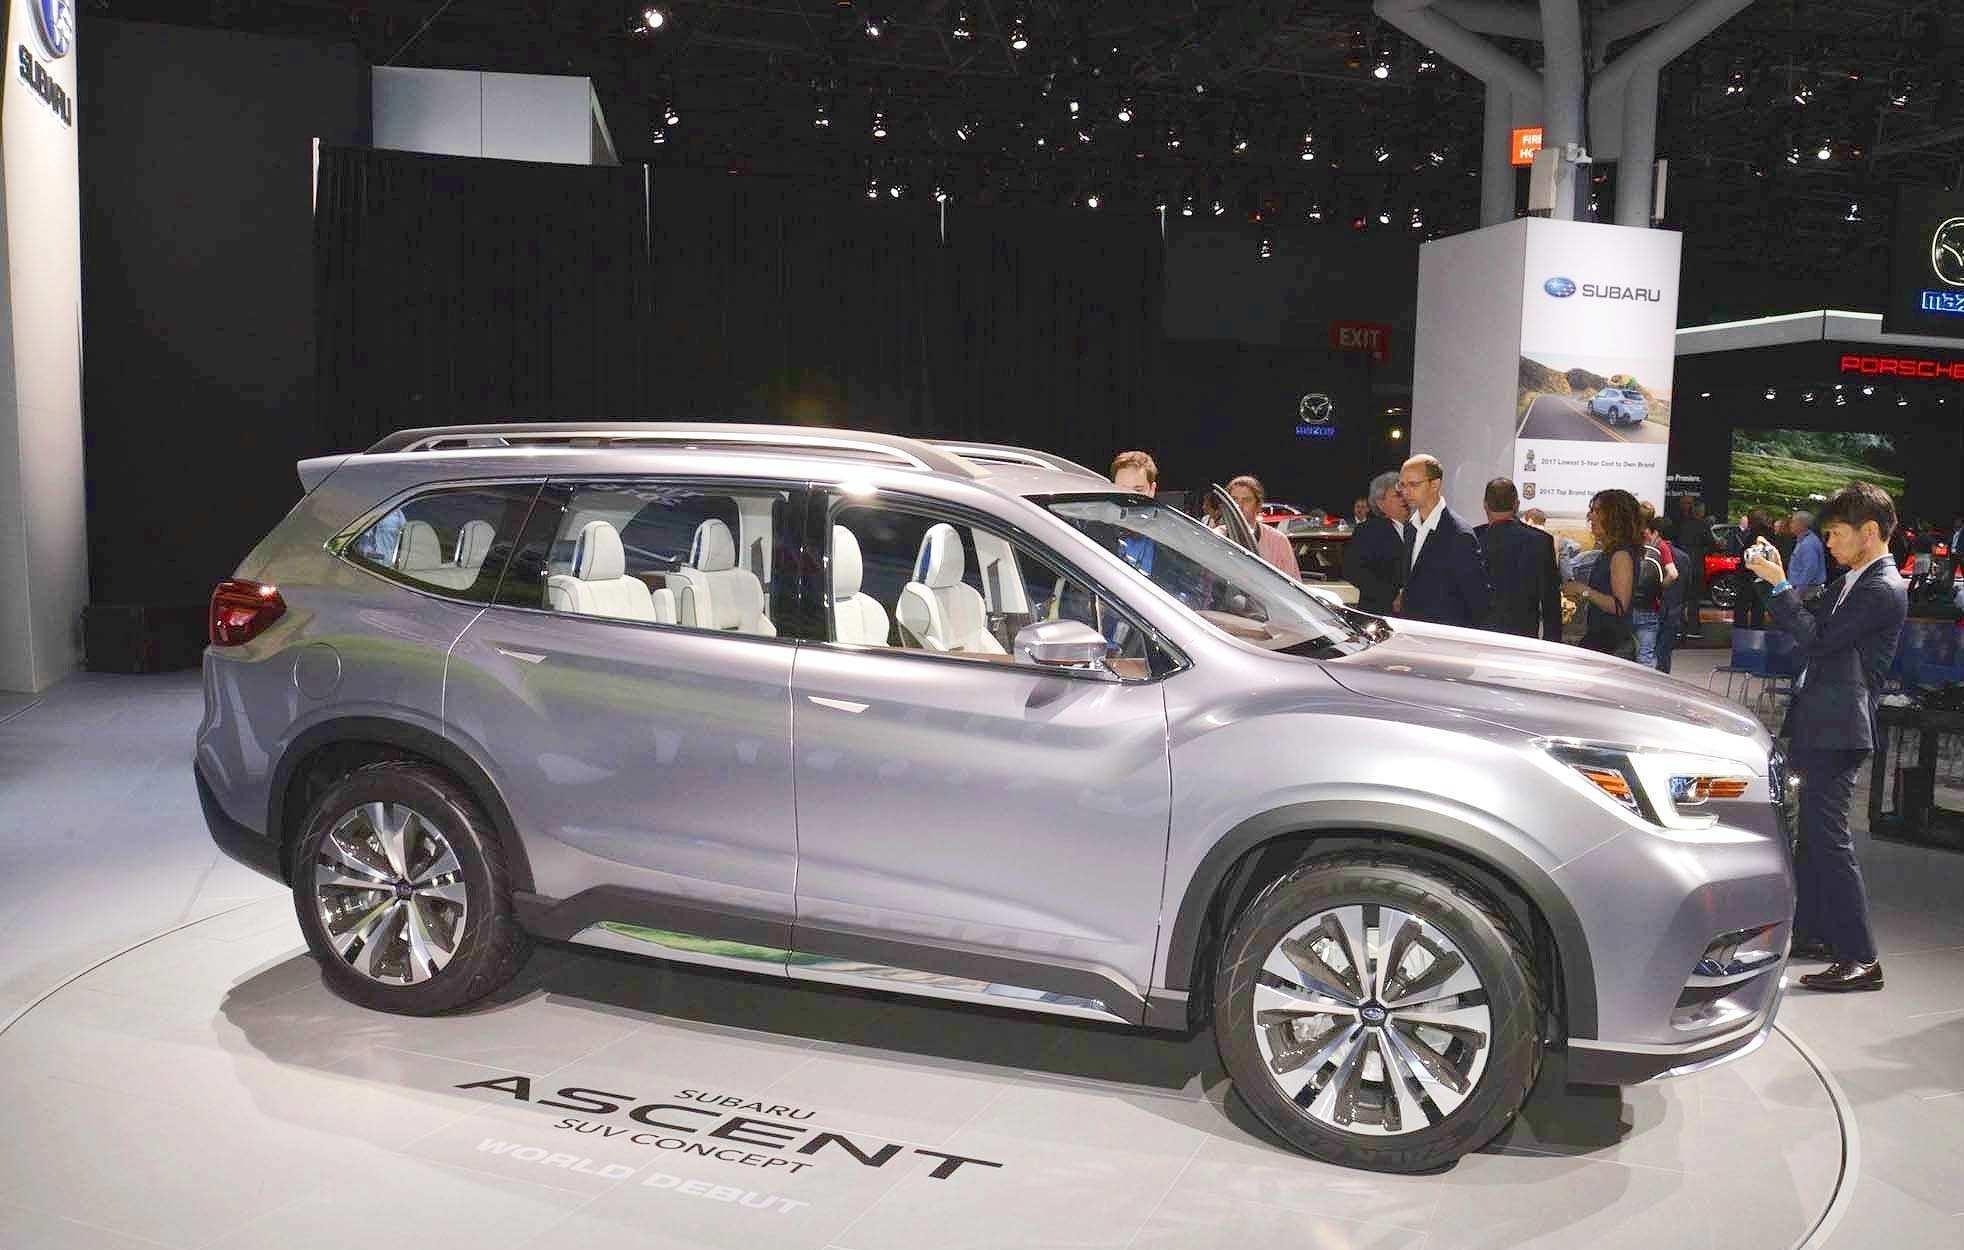 86 Gallery of 2019 Nissan Pathfinder Hybrid History for 2019 Nissan Pathfinder Hybrid